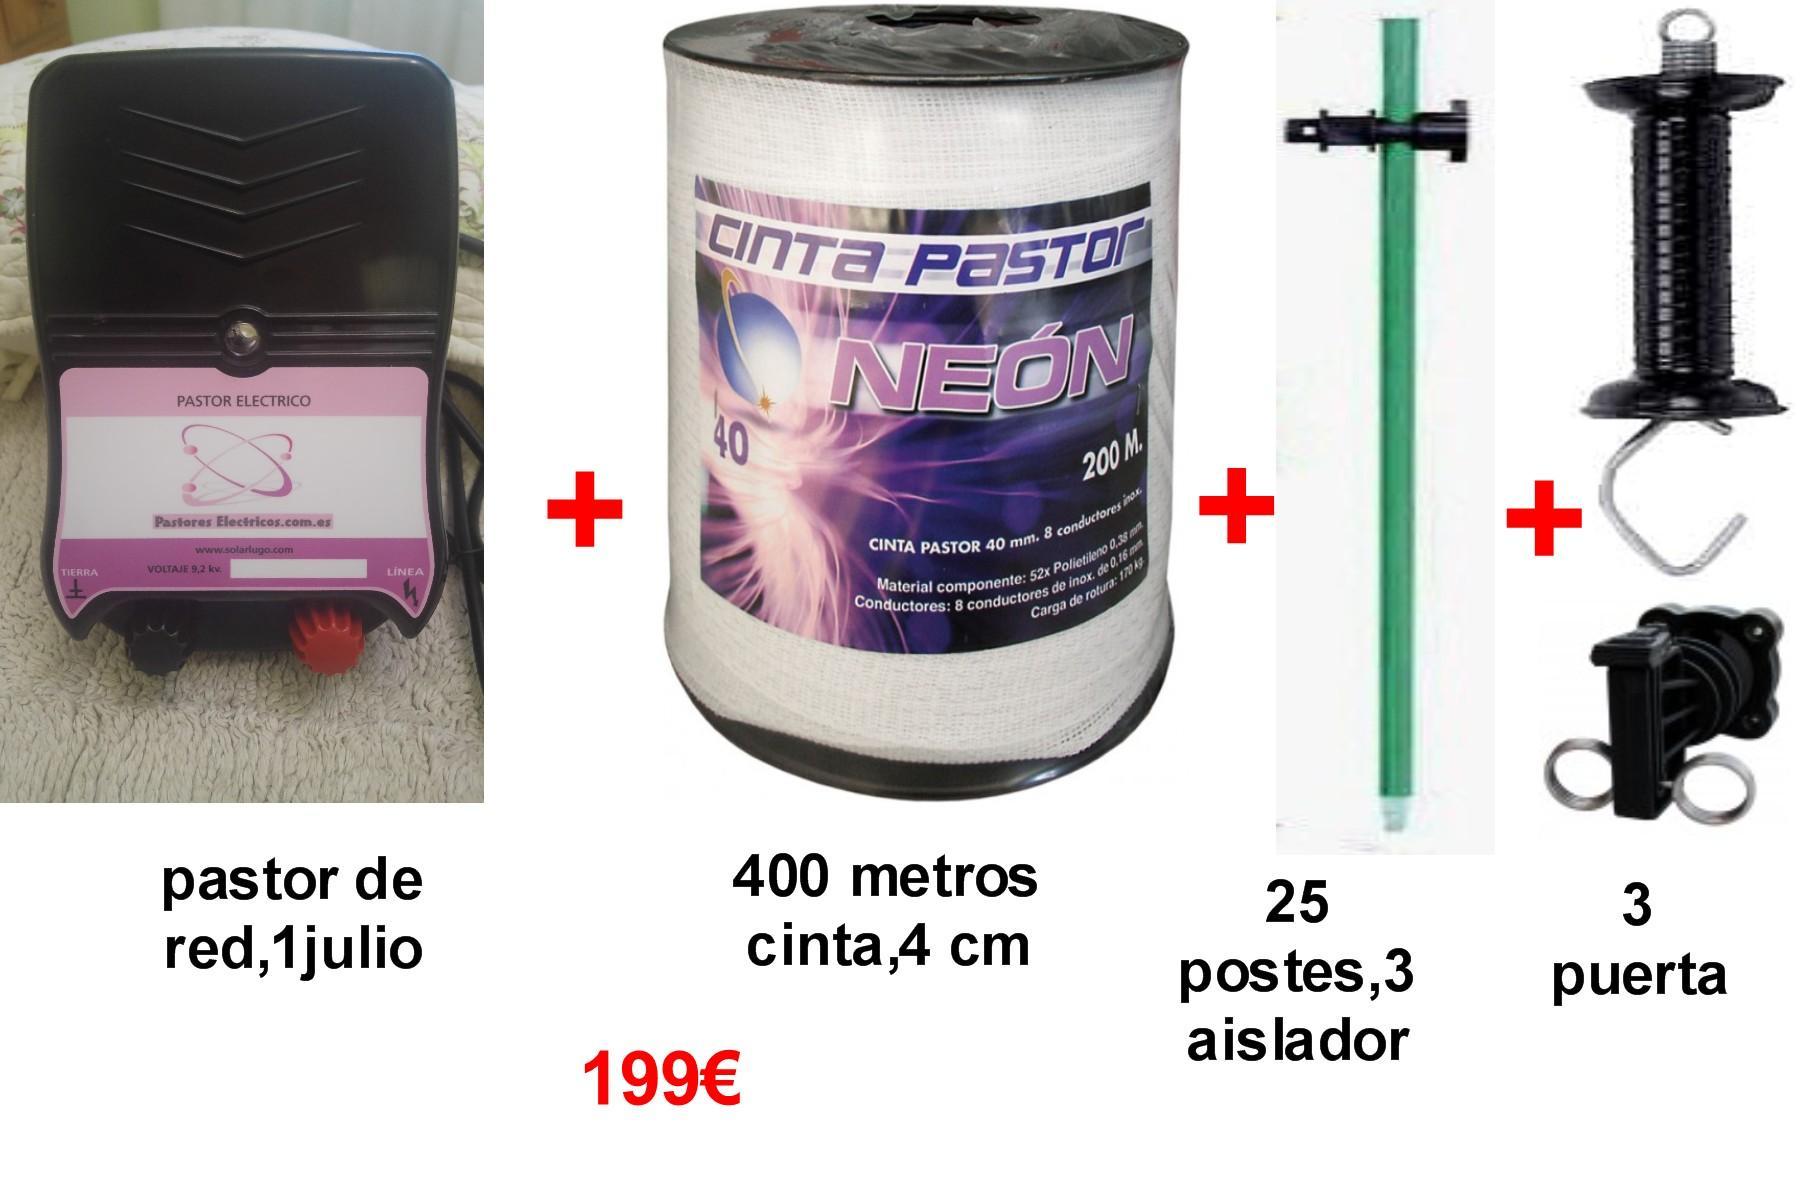 Kit pastor electrico de red